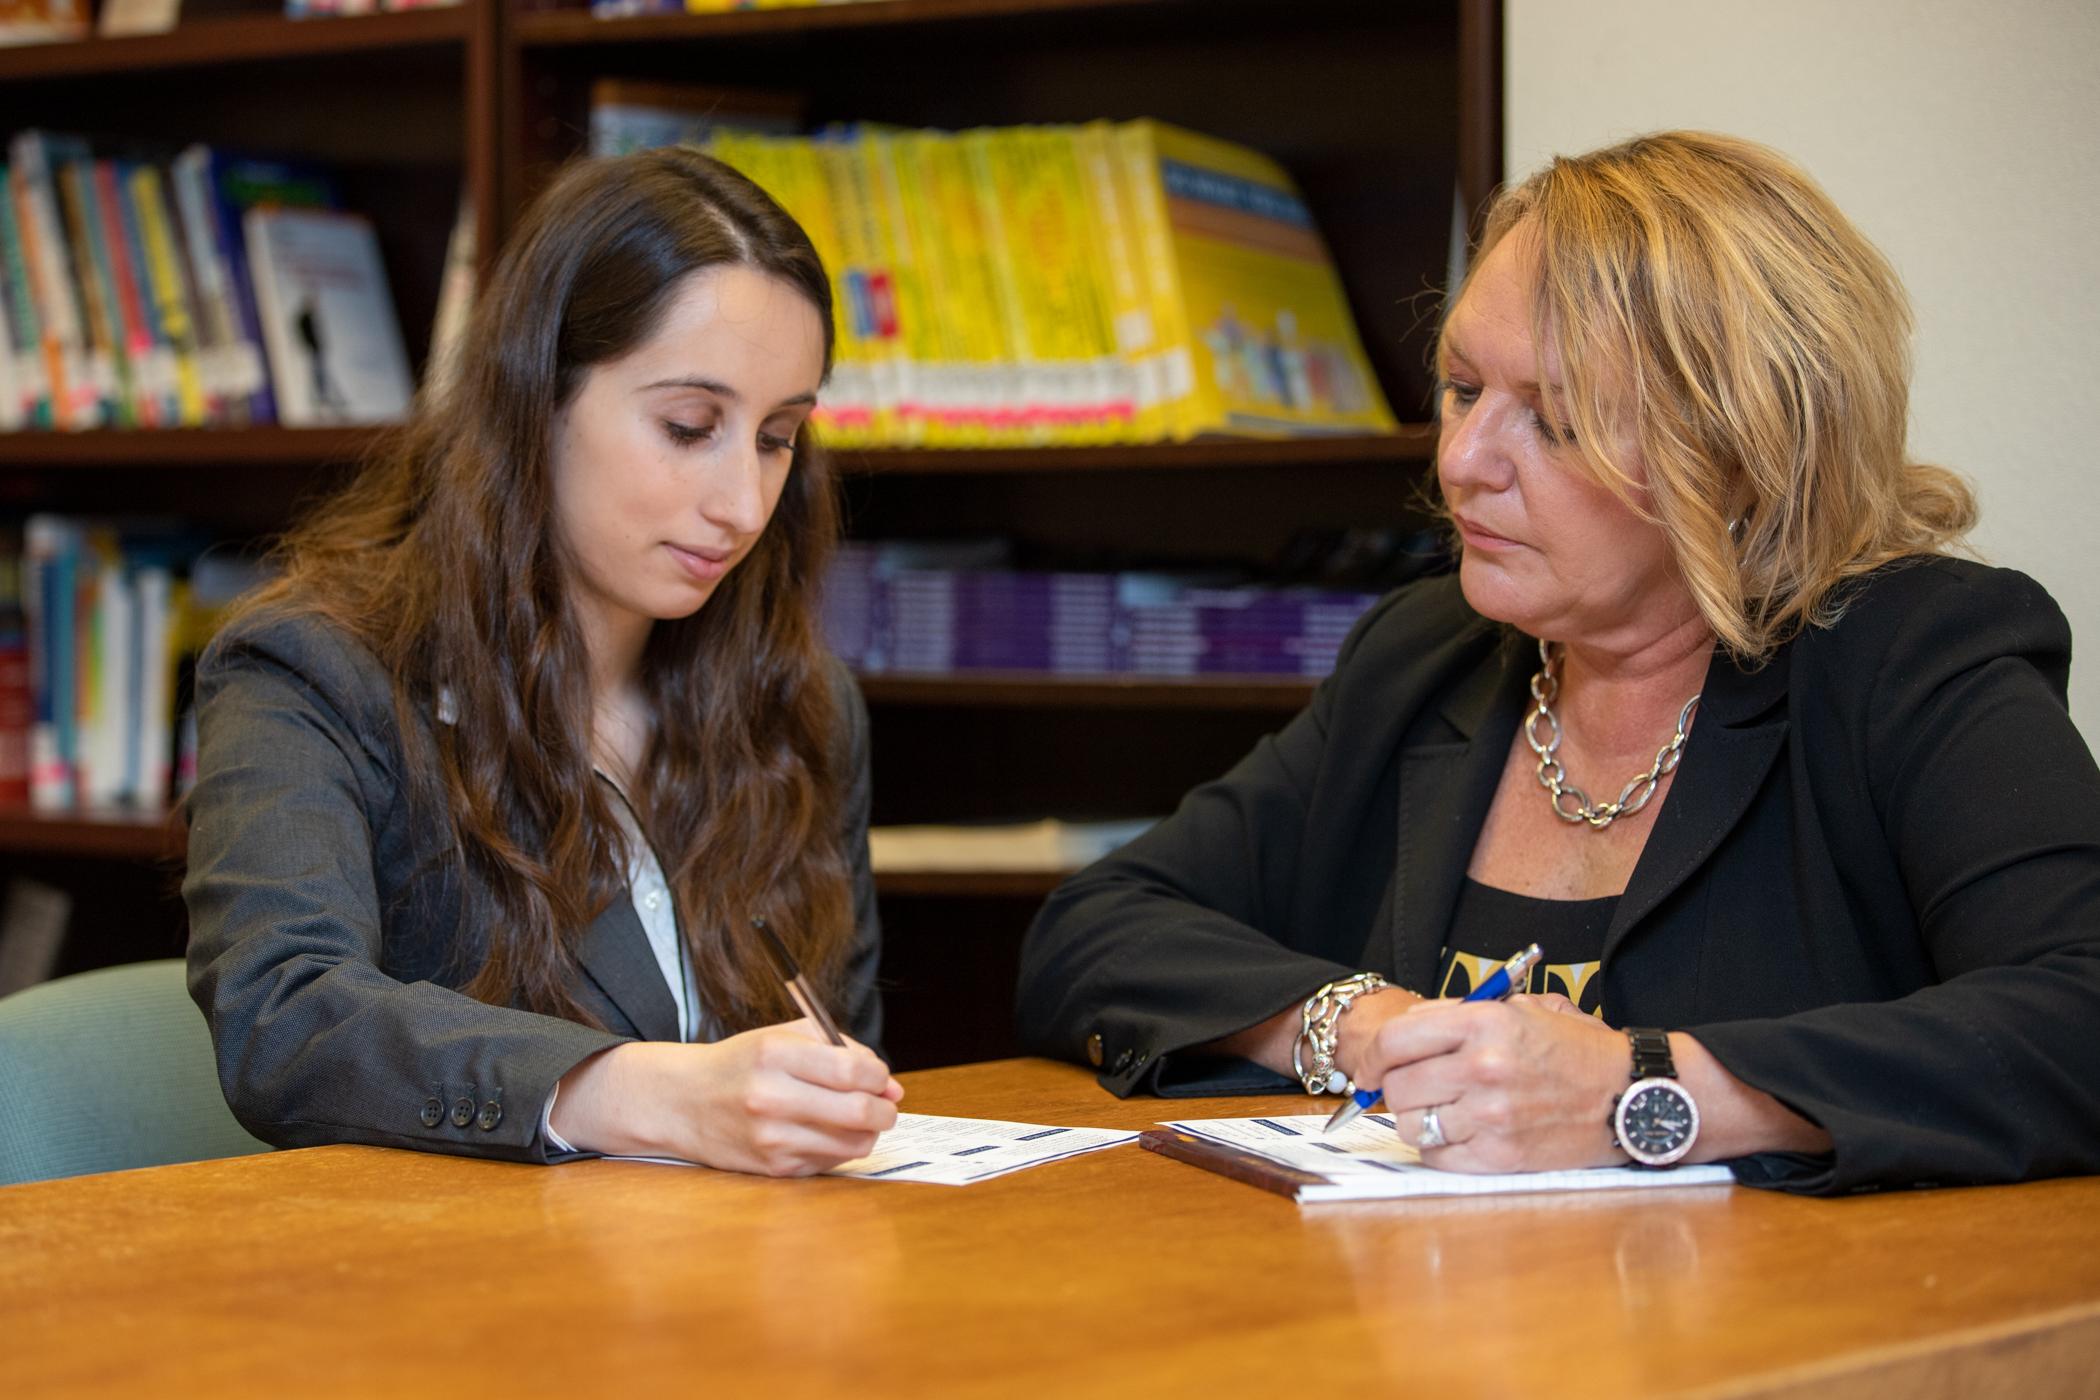 Immaculata University Prepares Students for the Virtual Job Market